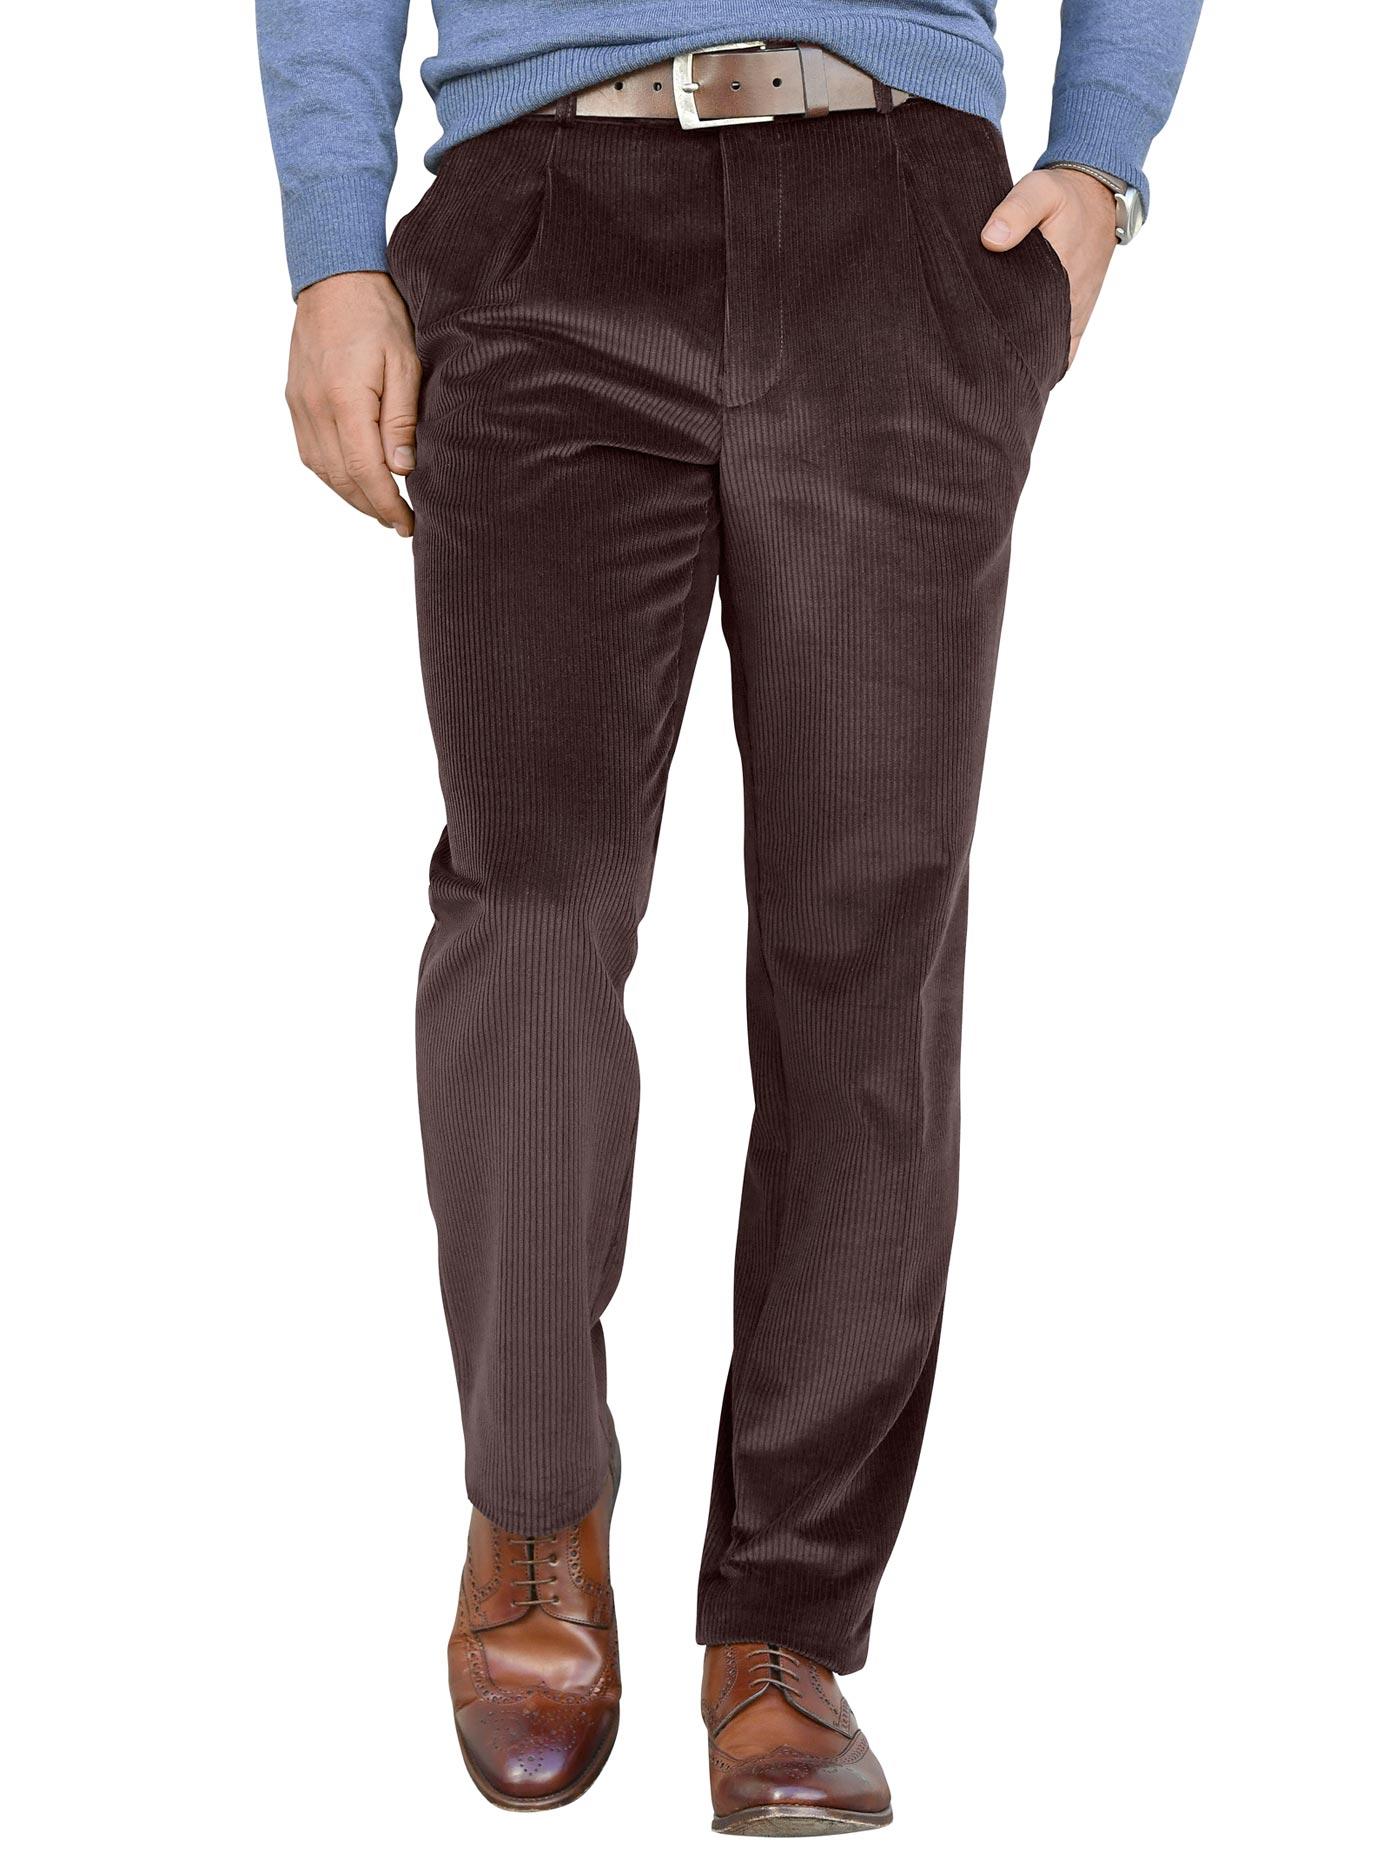 Classic Stretchcord-Hose aus dehnbarem Stretchcord | Bekleidung > Hosen > Cordhosen | Braun | Polyamid | Classic